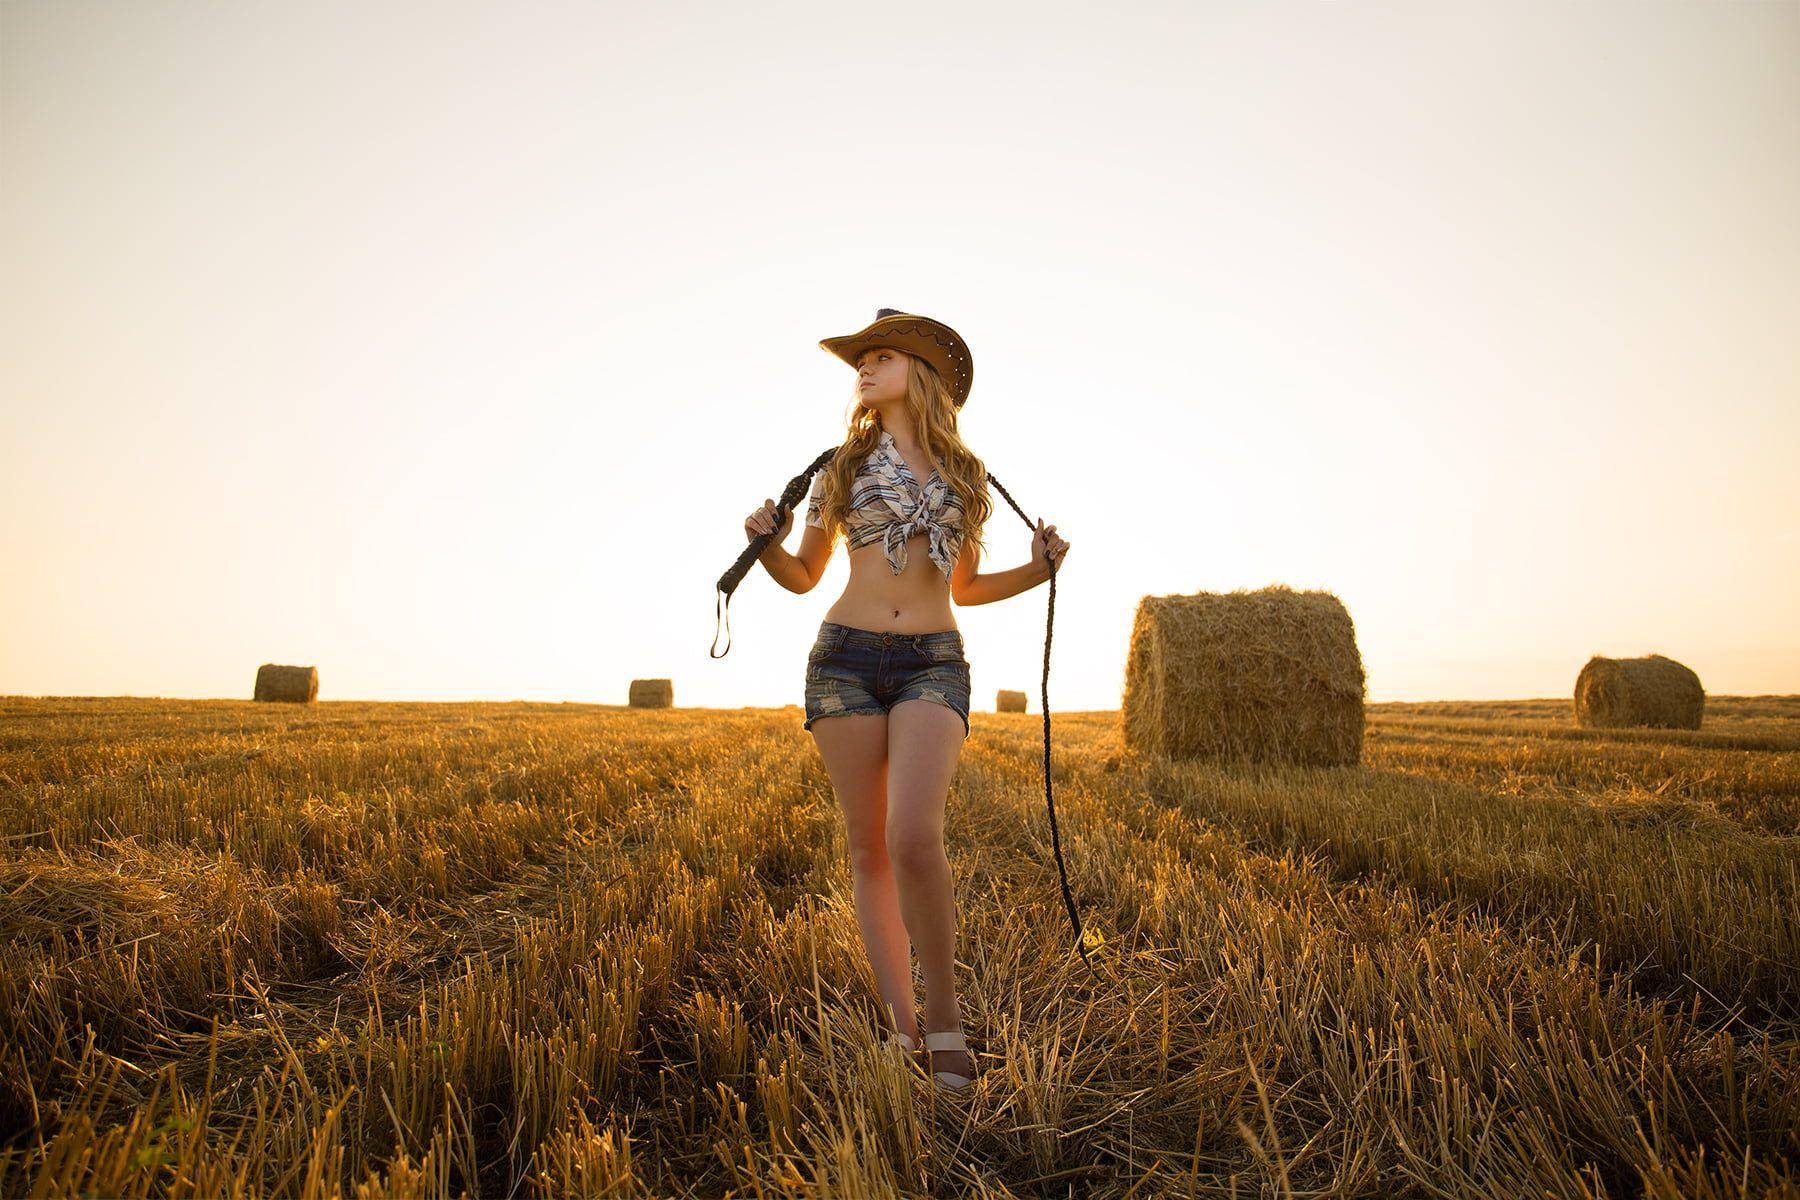 women's white and blue plaid crop top and blue denim short shorts #women #blonde plaid shirt #hay cowboy hats jean shorts #belly women outdoors #cowgirl looking away #720P #wallpaper #hdwallpaper #desktop